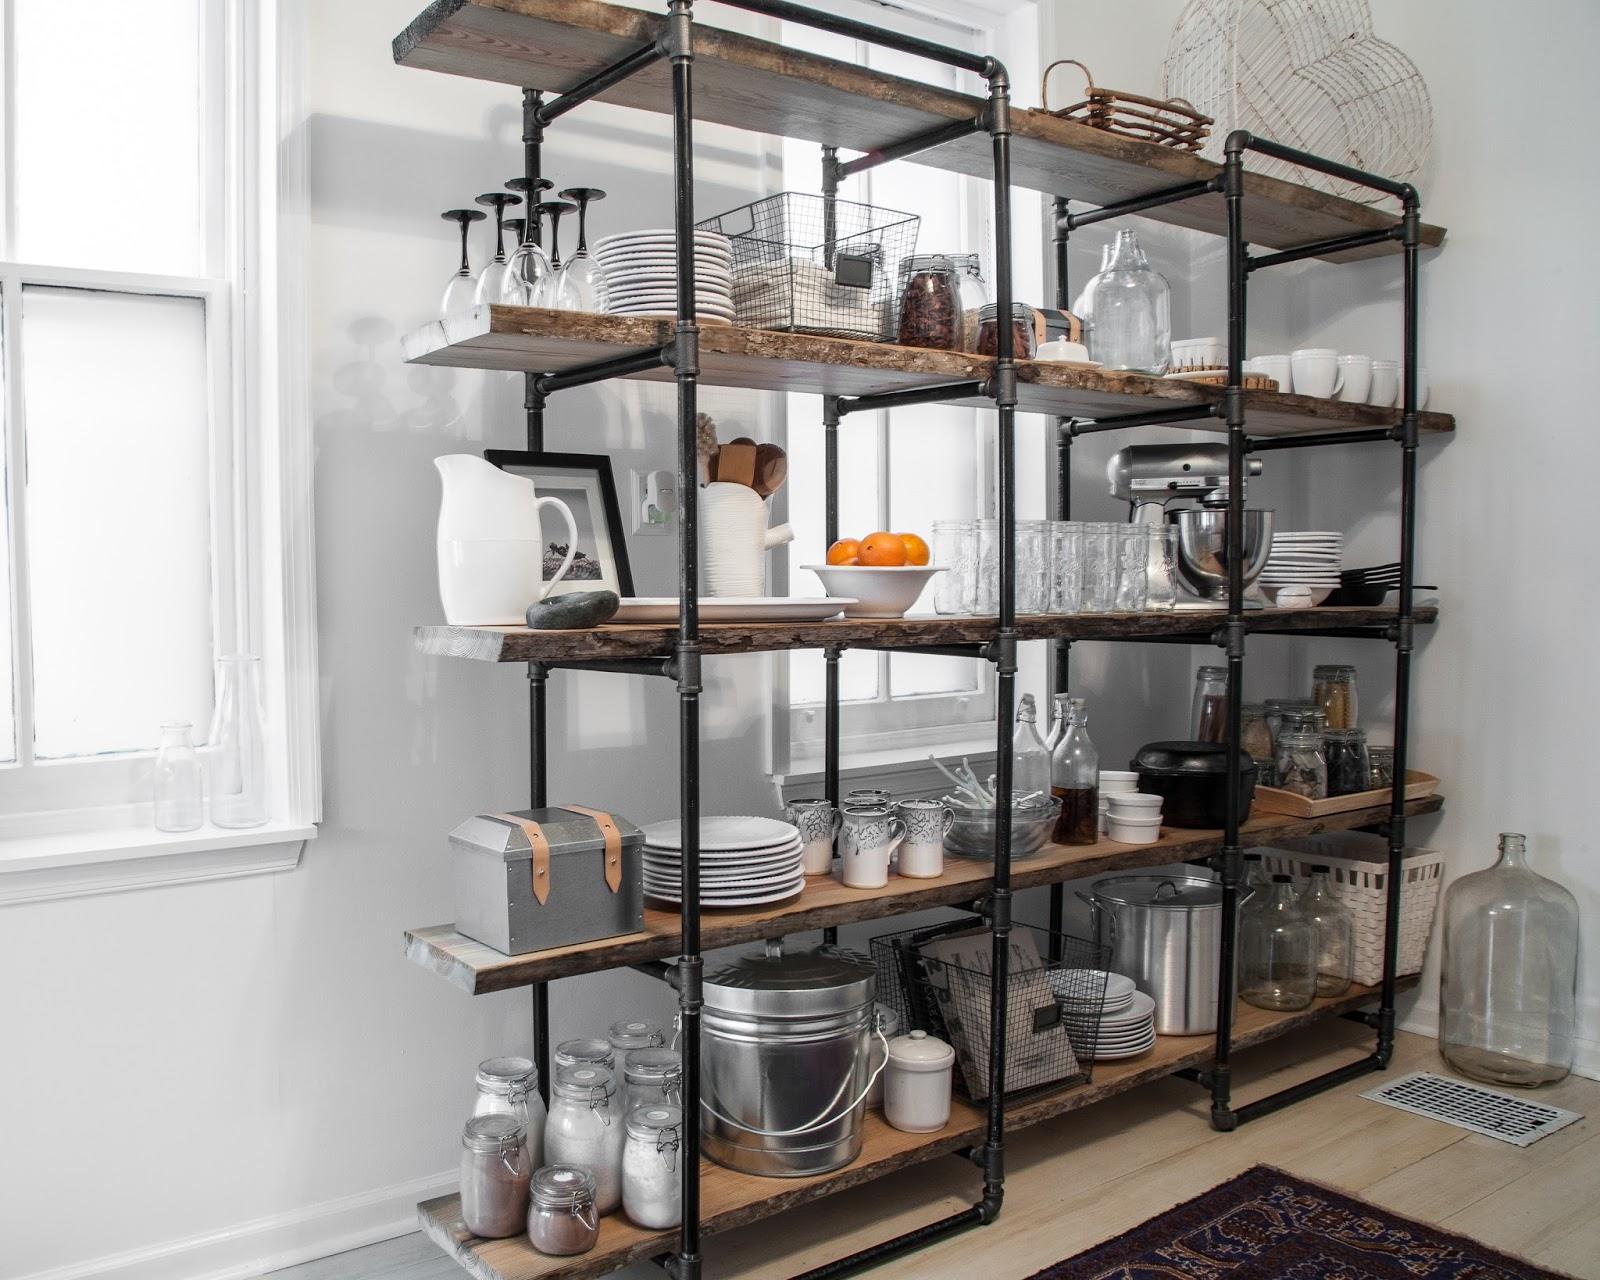 Open Metal Shelving Kitchen Planner Online Diy Project How To Build A Freestanding Industrial Shelf